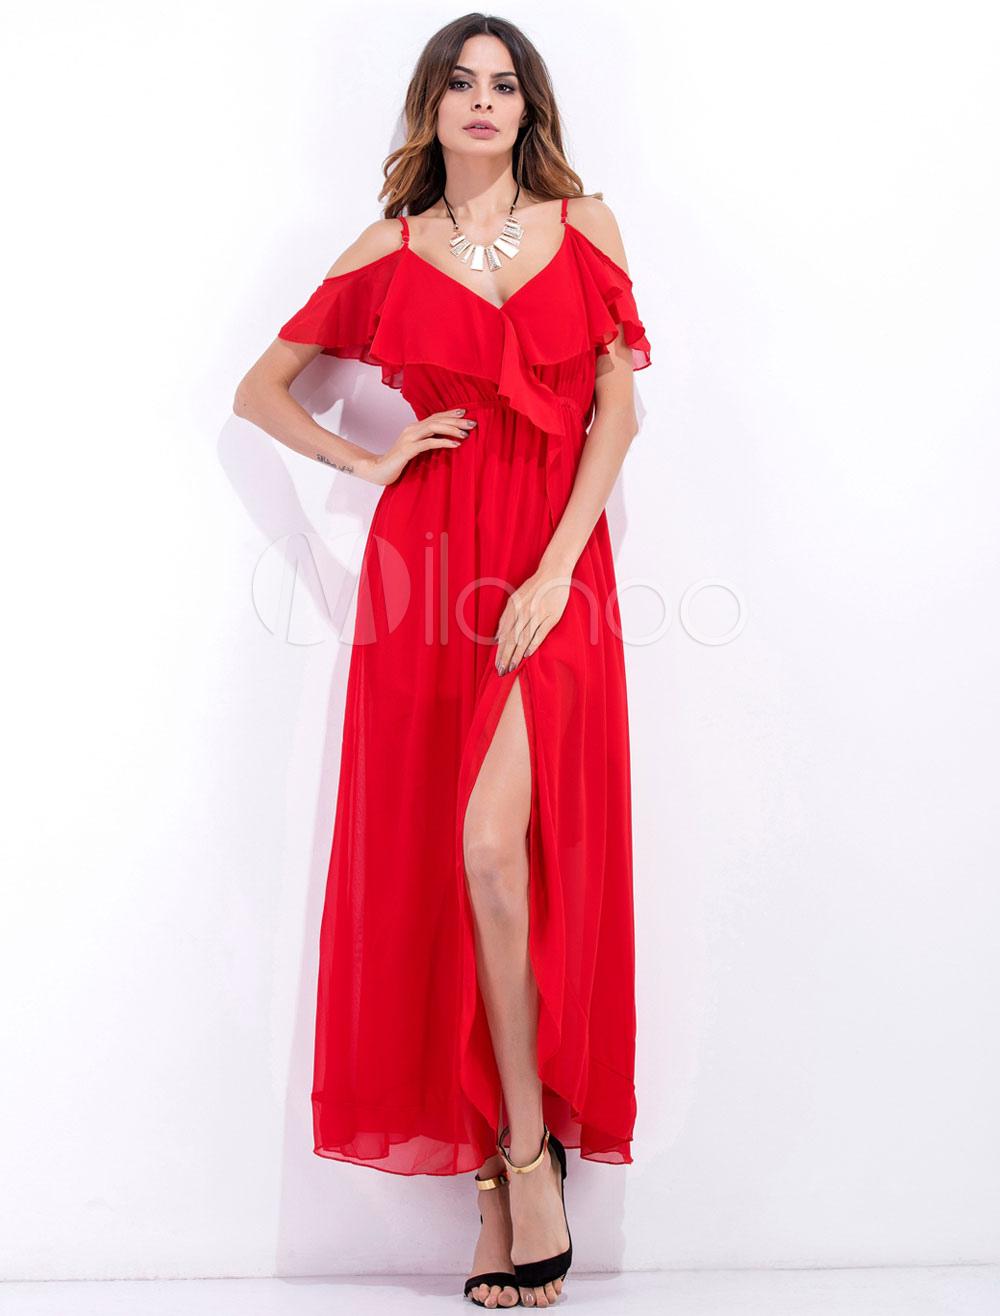 Red Maxi Dress Chiffon Ruffle Strappy Pleated Slit Long Dress For Women (Women\\'s Clothing Maxi Dresses) photo